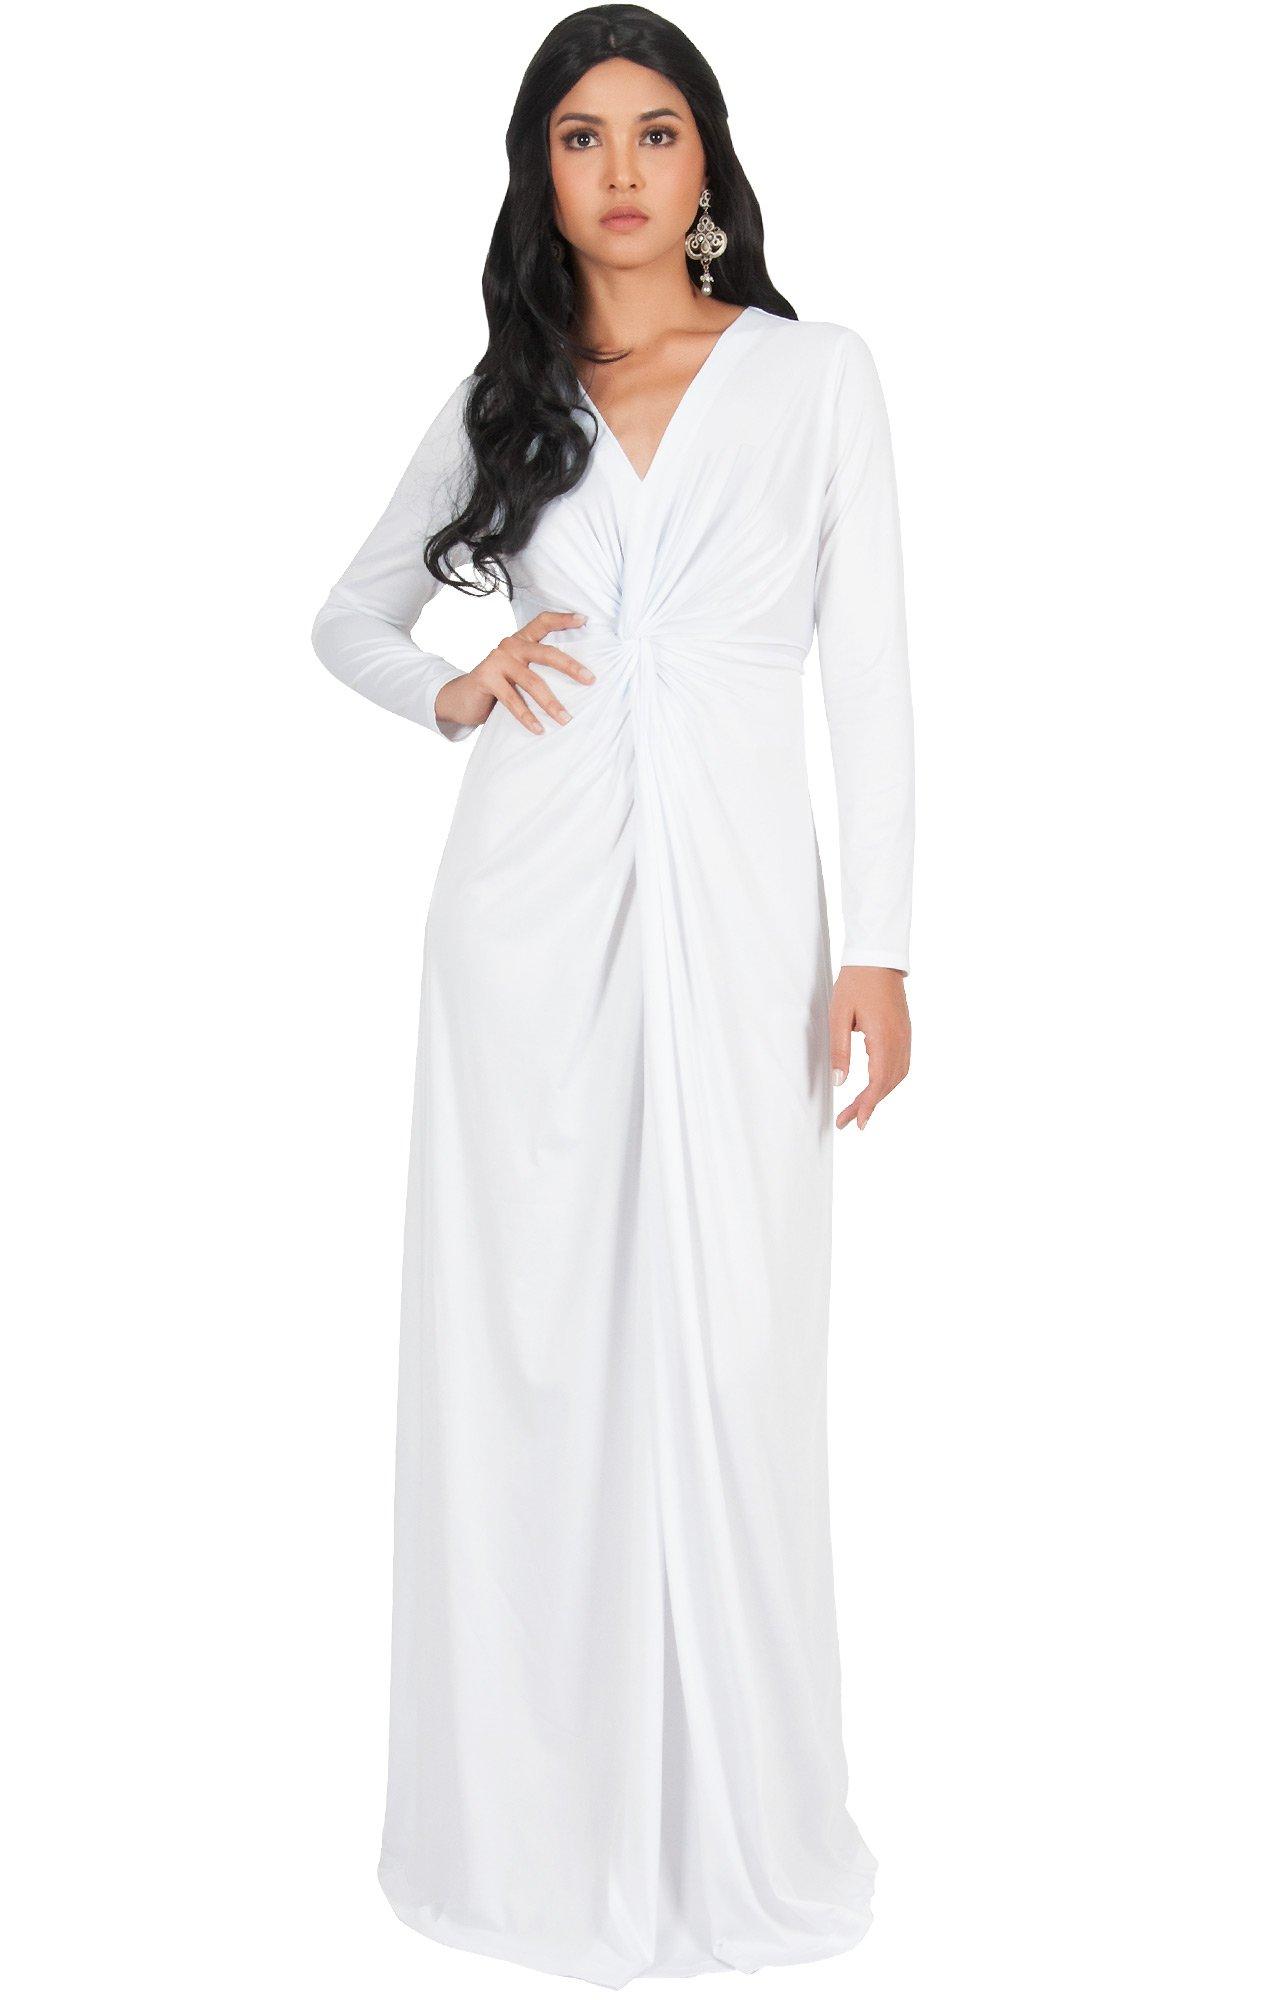 KOH KOH Womens Plus Size Womens Long Sleeve Sleeves V-Neck ...